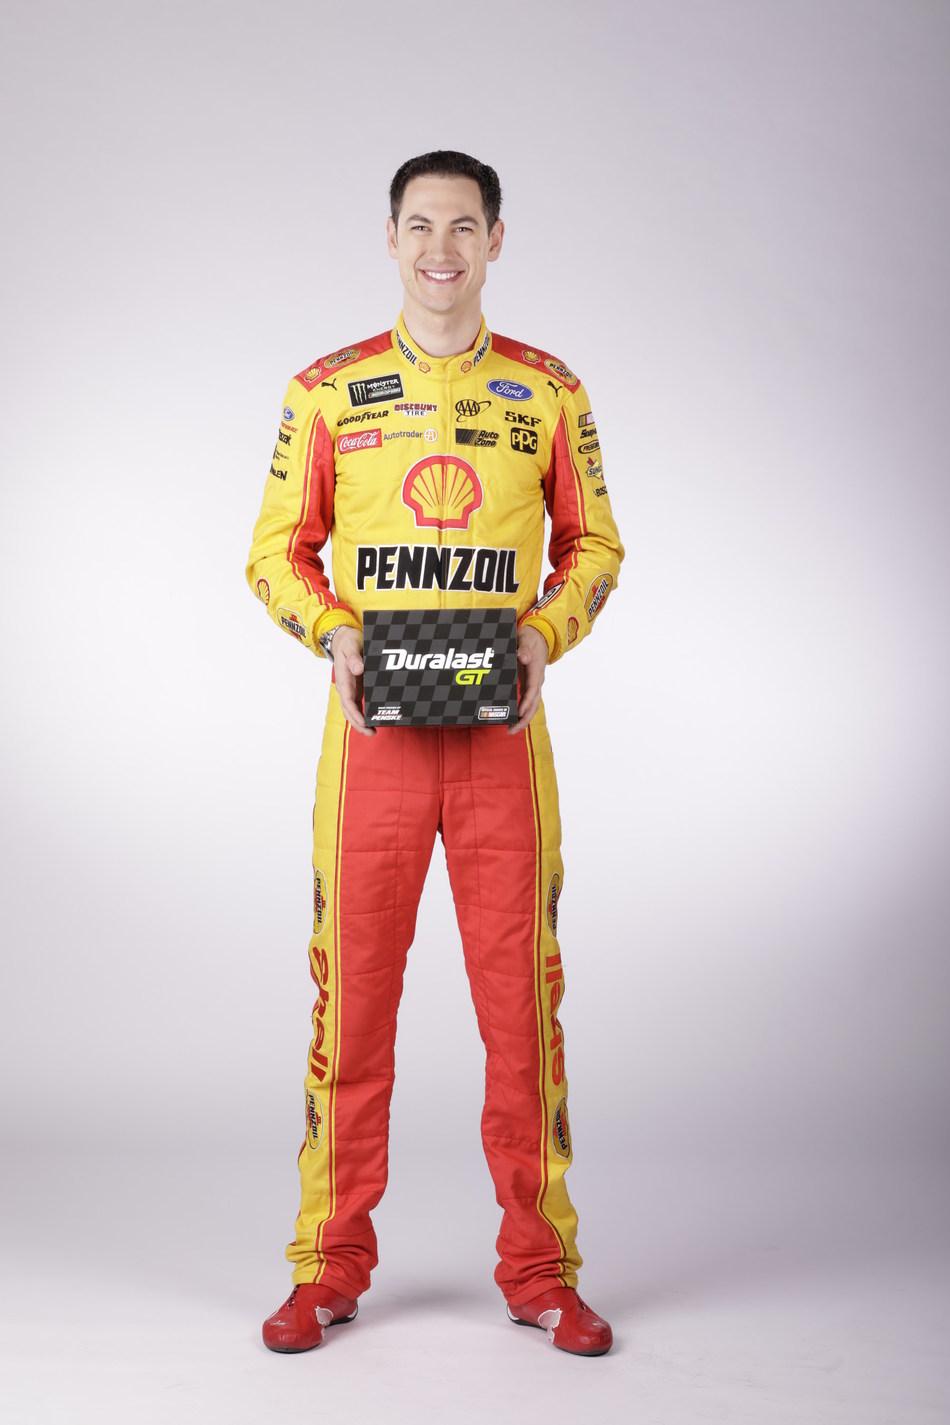 AutoZone Introduces New Duralast GT(SM) Brake Pads with Team Penske Driver Joey Logano (PRNewsFoto/AutoZone, Inc.)